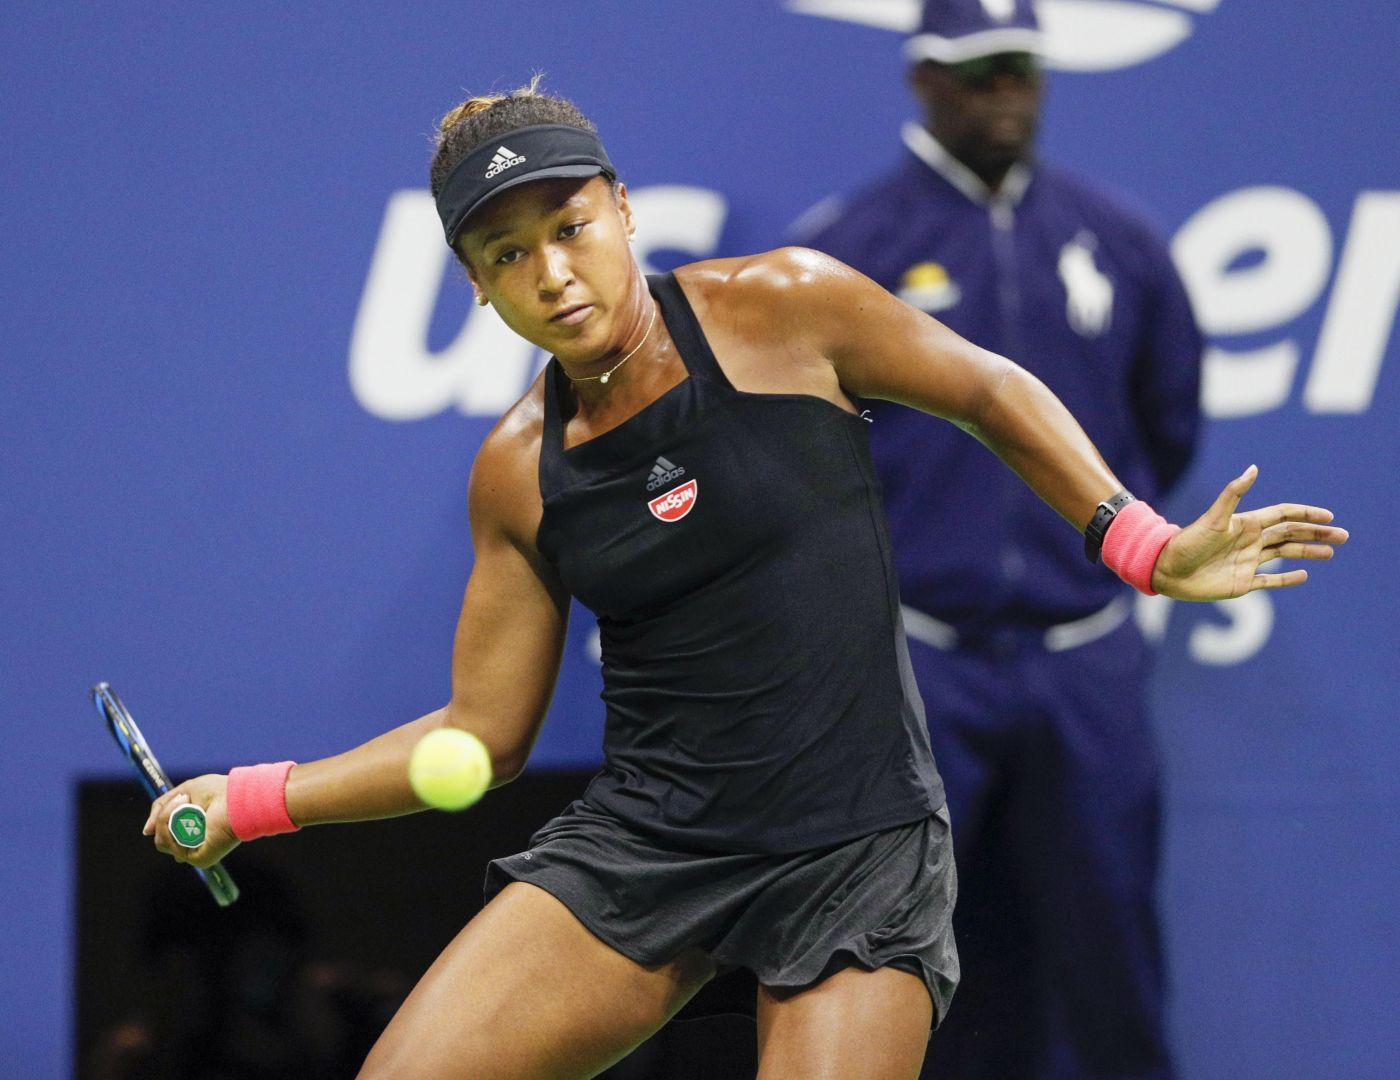 [PHOTOS] Naomi Osaka Becomes First Japanese To Win U.S. Grand Slam